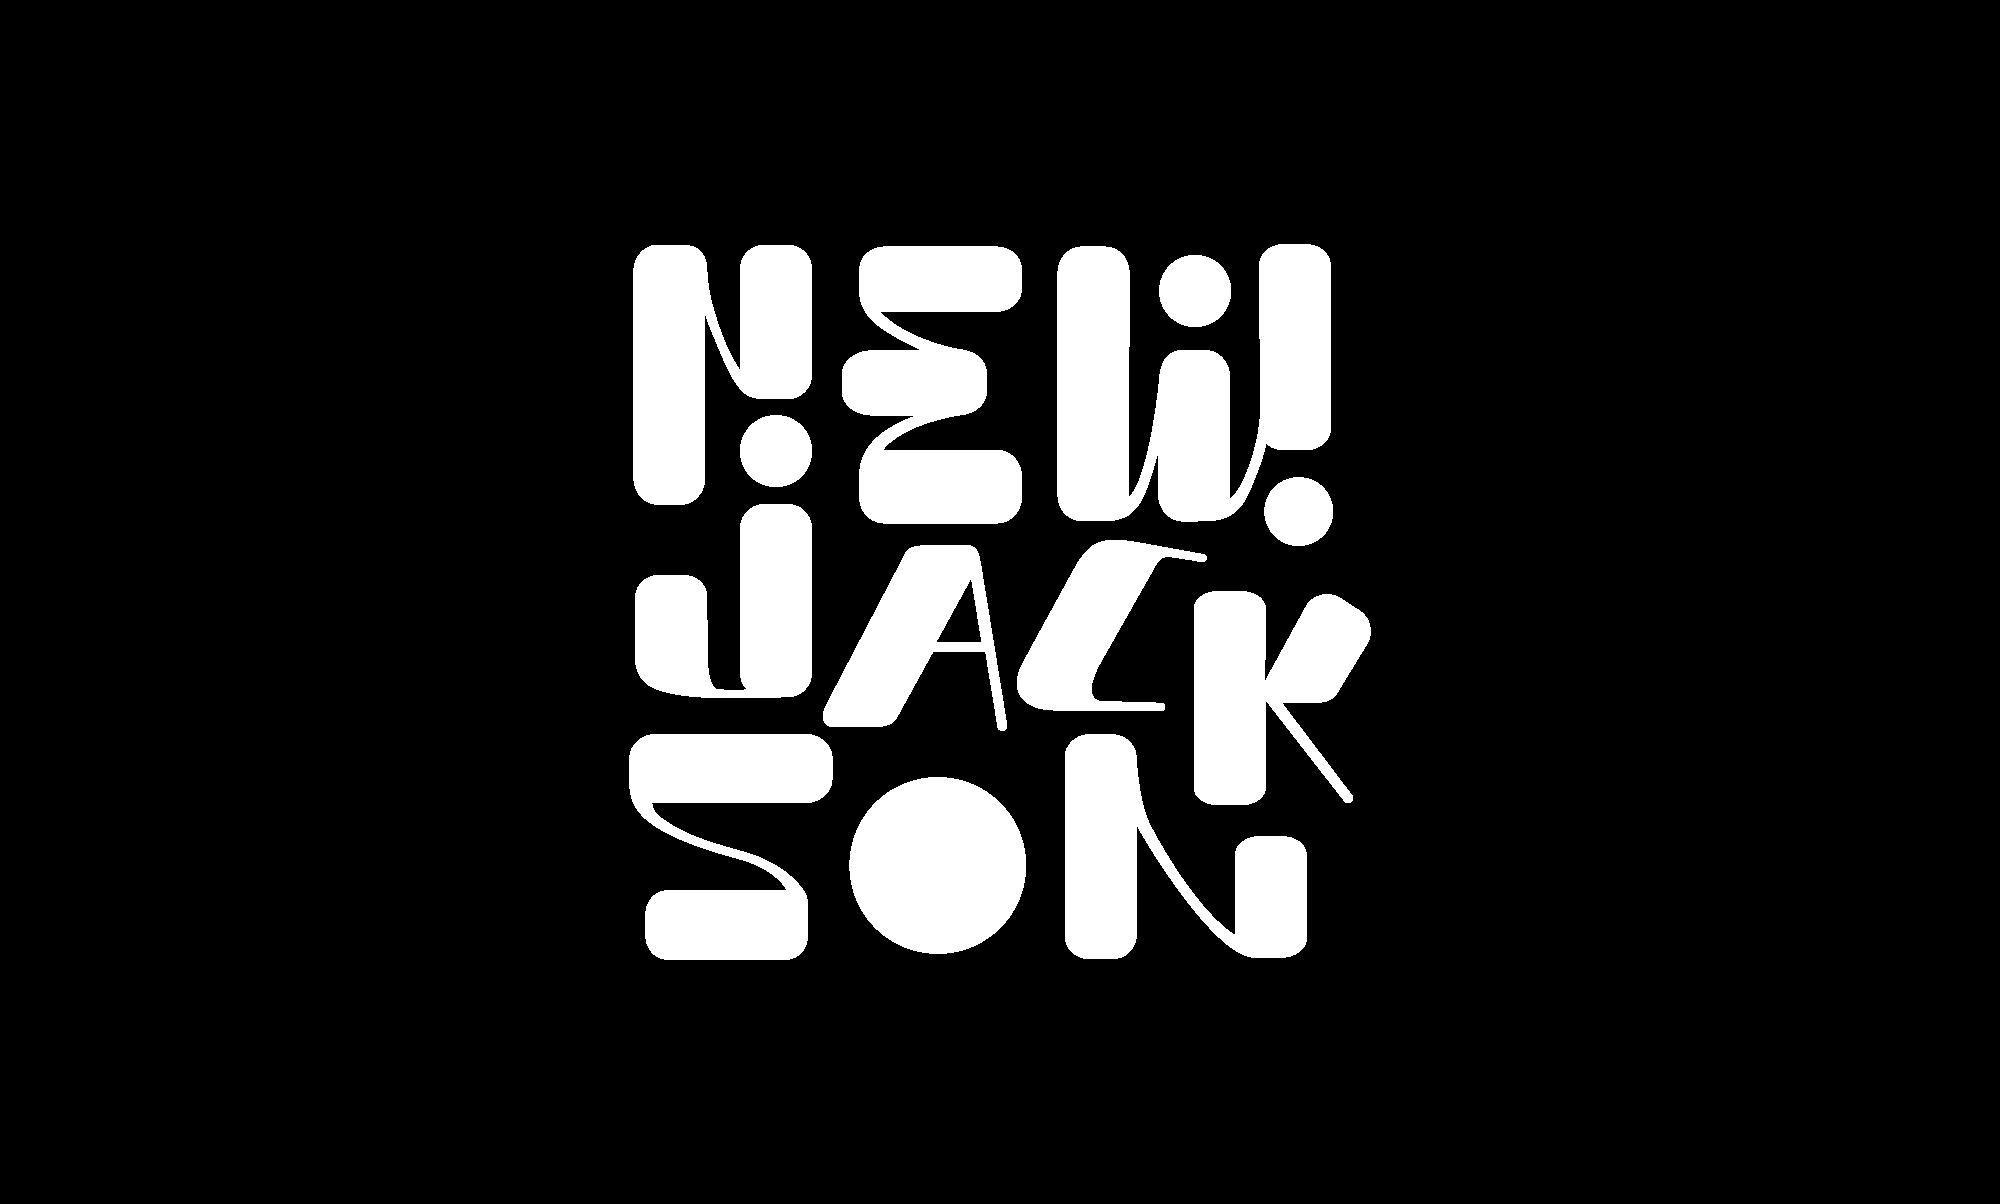 Cover image: New Jackson Logo + Record Sleeve